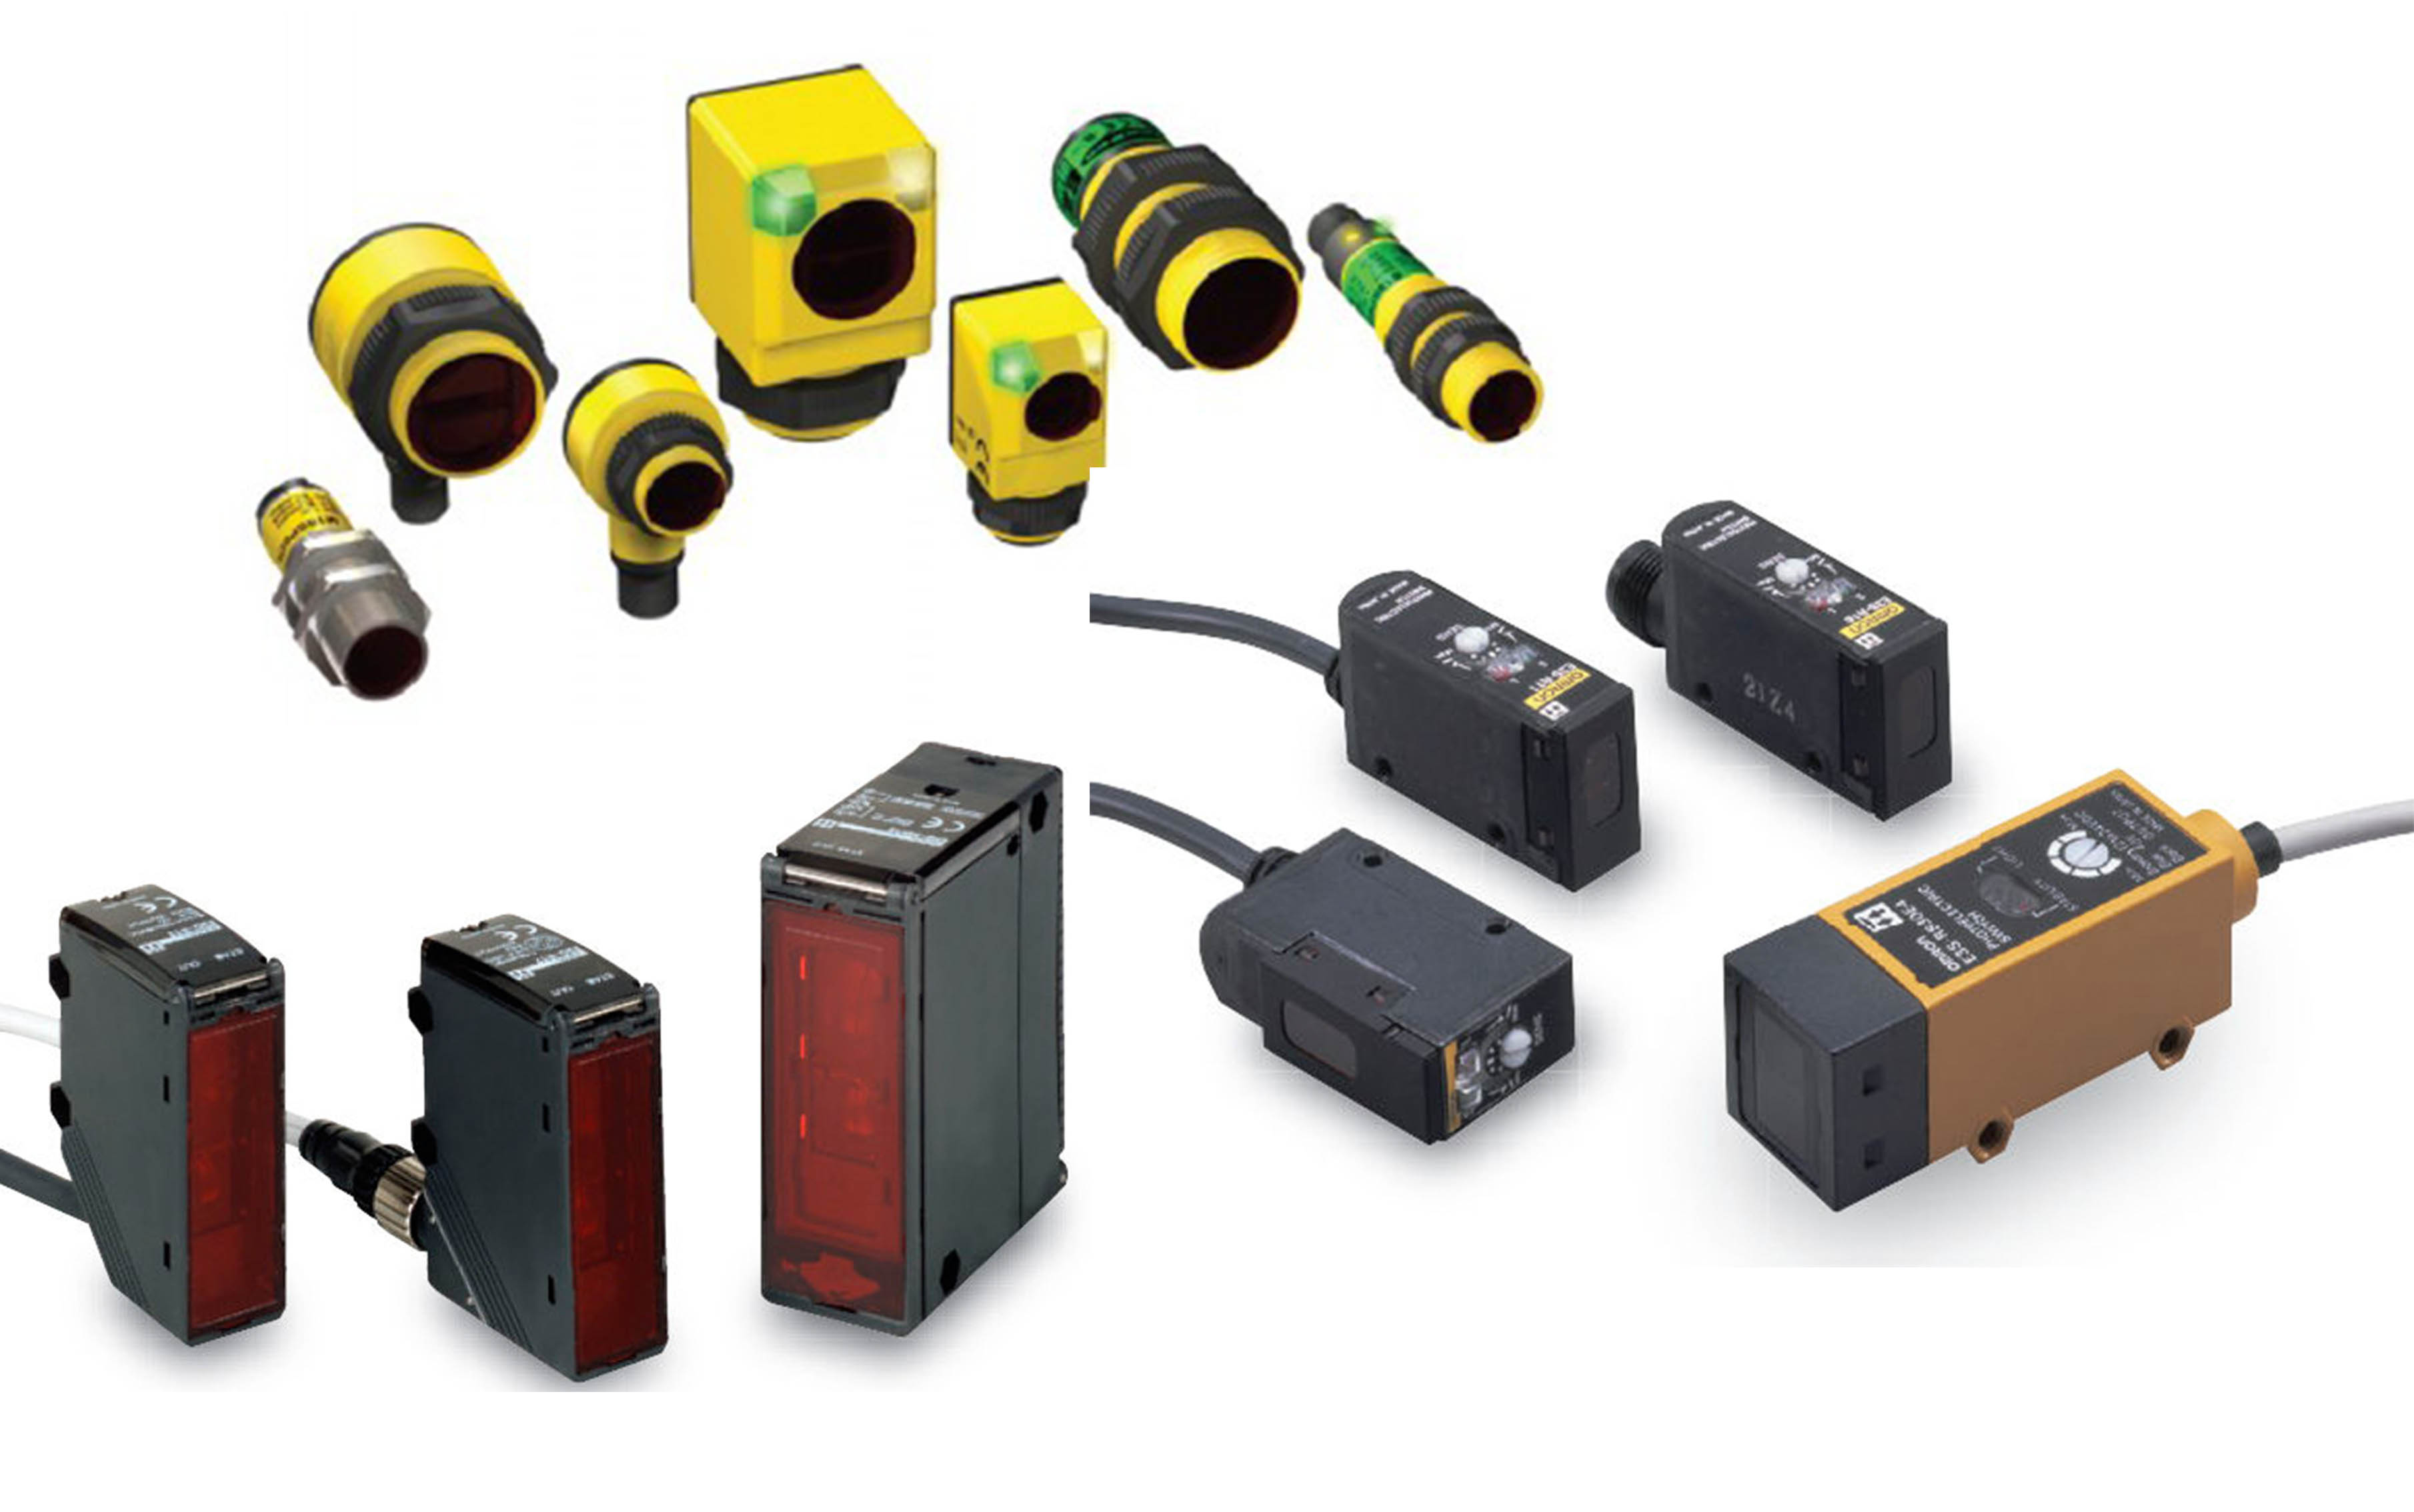 Sensor อุตสาหกรรมโรงงาน คืออะไร ทำงานอย่างไร